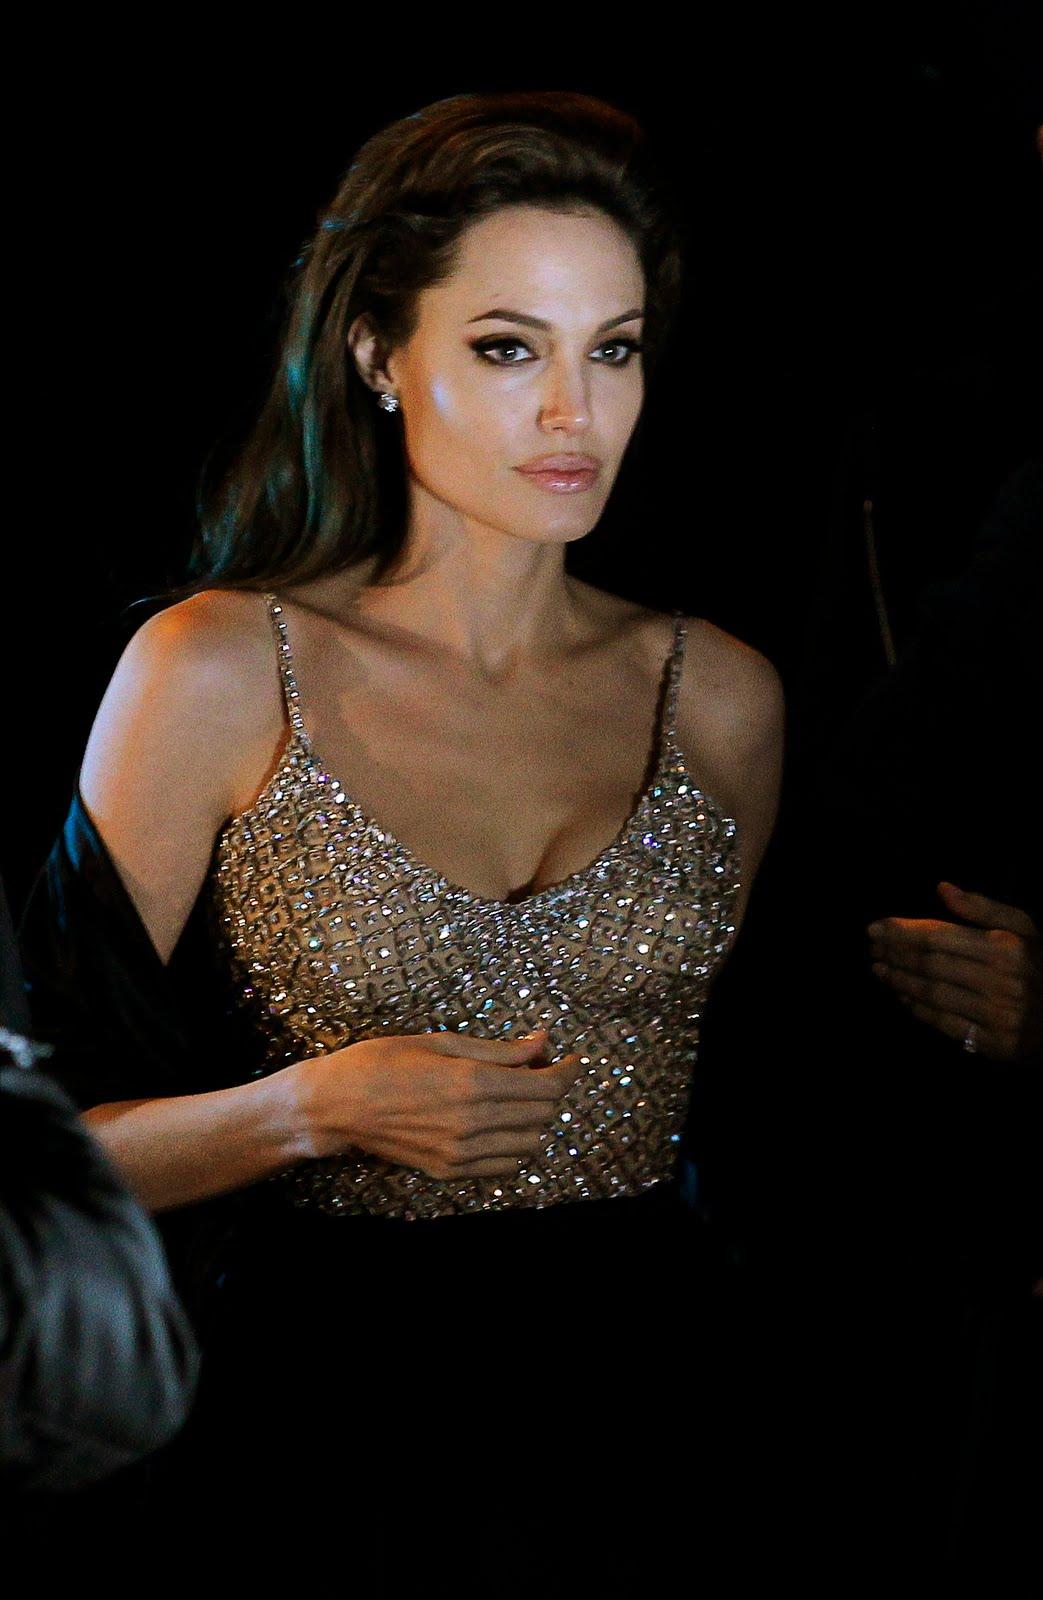 http://3.bp.blogspot.com/_ImioM_zH-NY/TRJQ28Hz6lI/AAAAAAAABIE/mutdxibxDzY/s1600/Angelina-Jolie-91.jpg